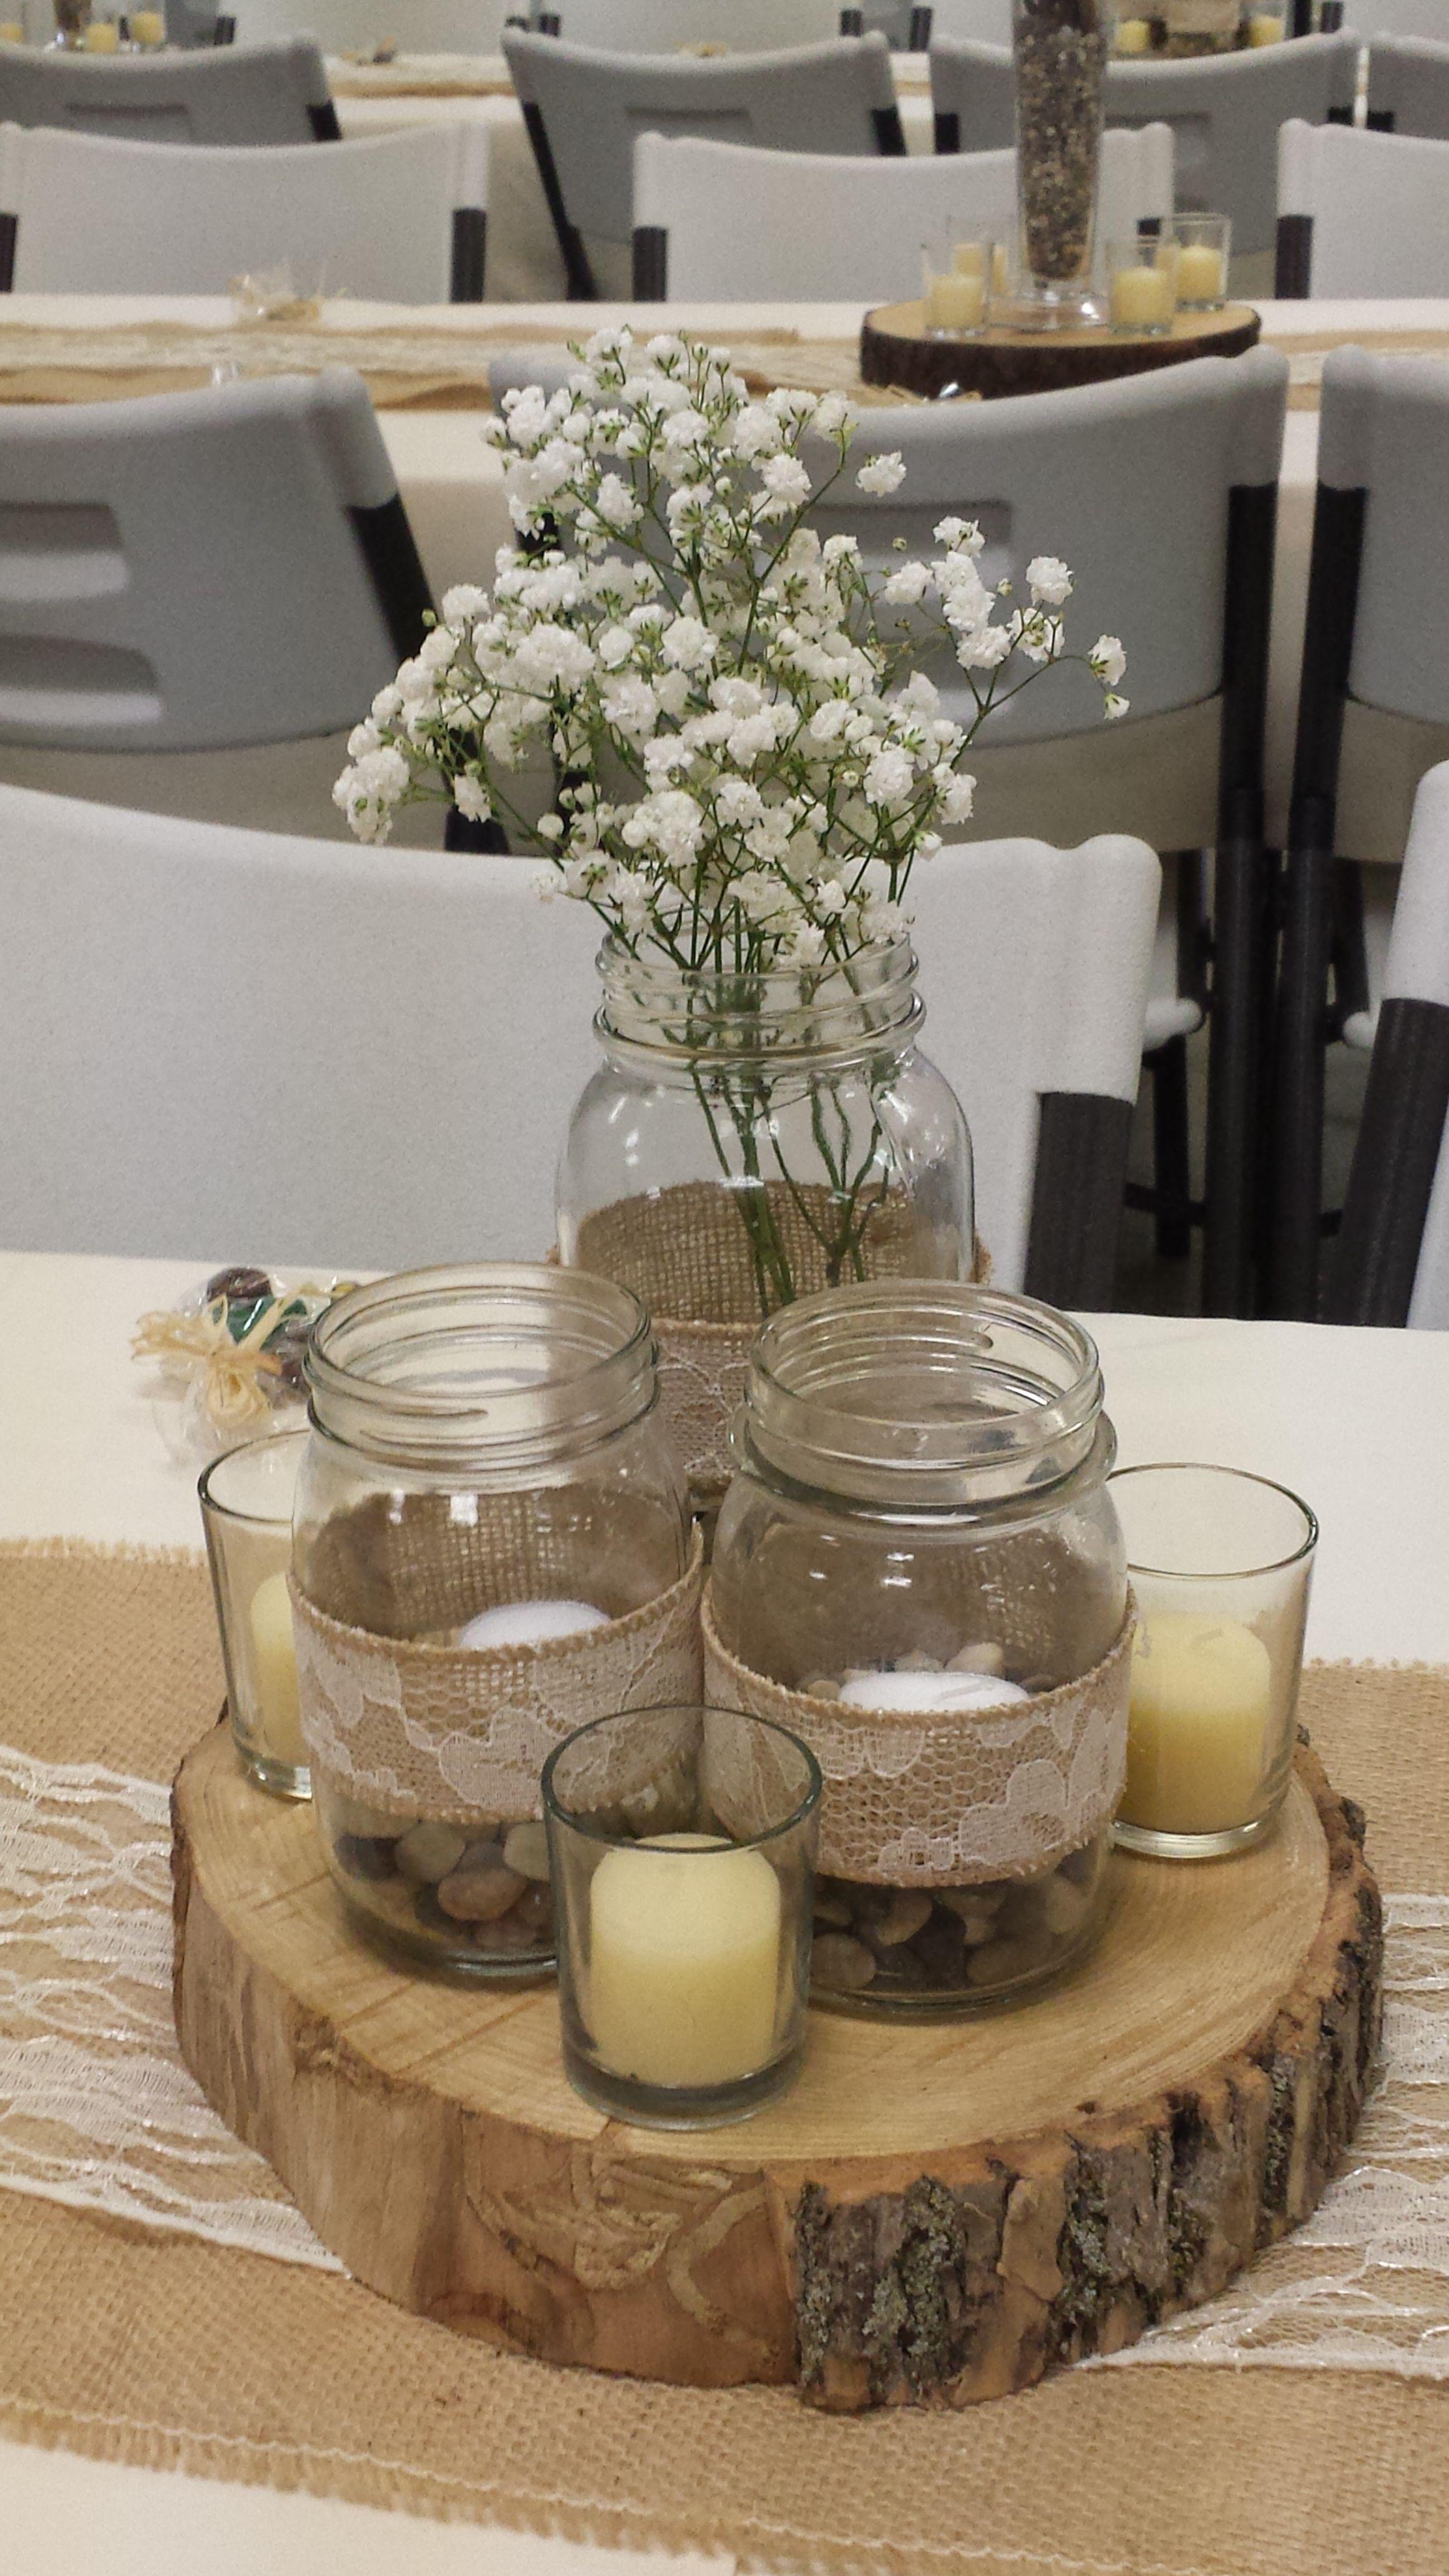 Rustic wedding centerpiece mason jar with